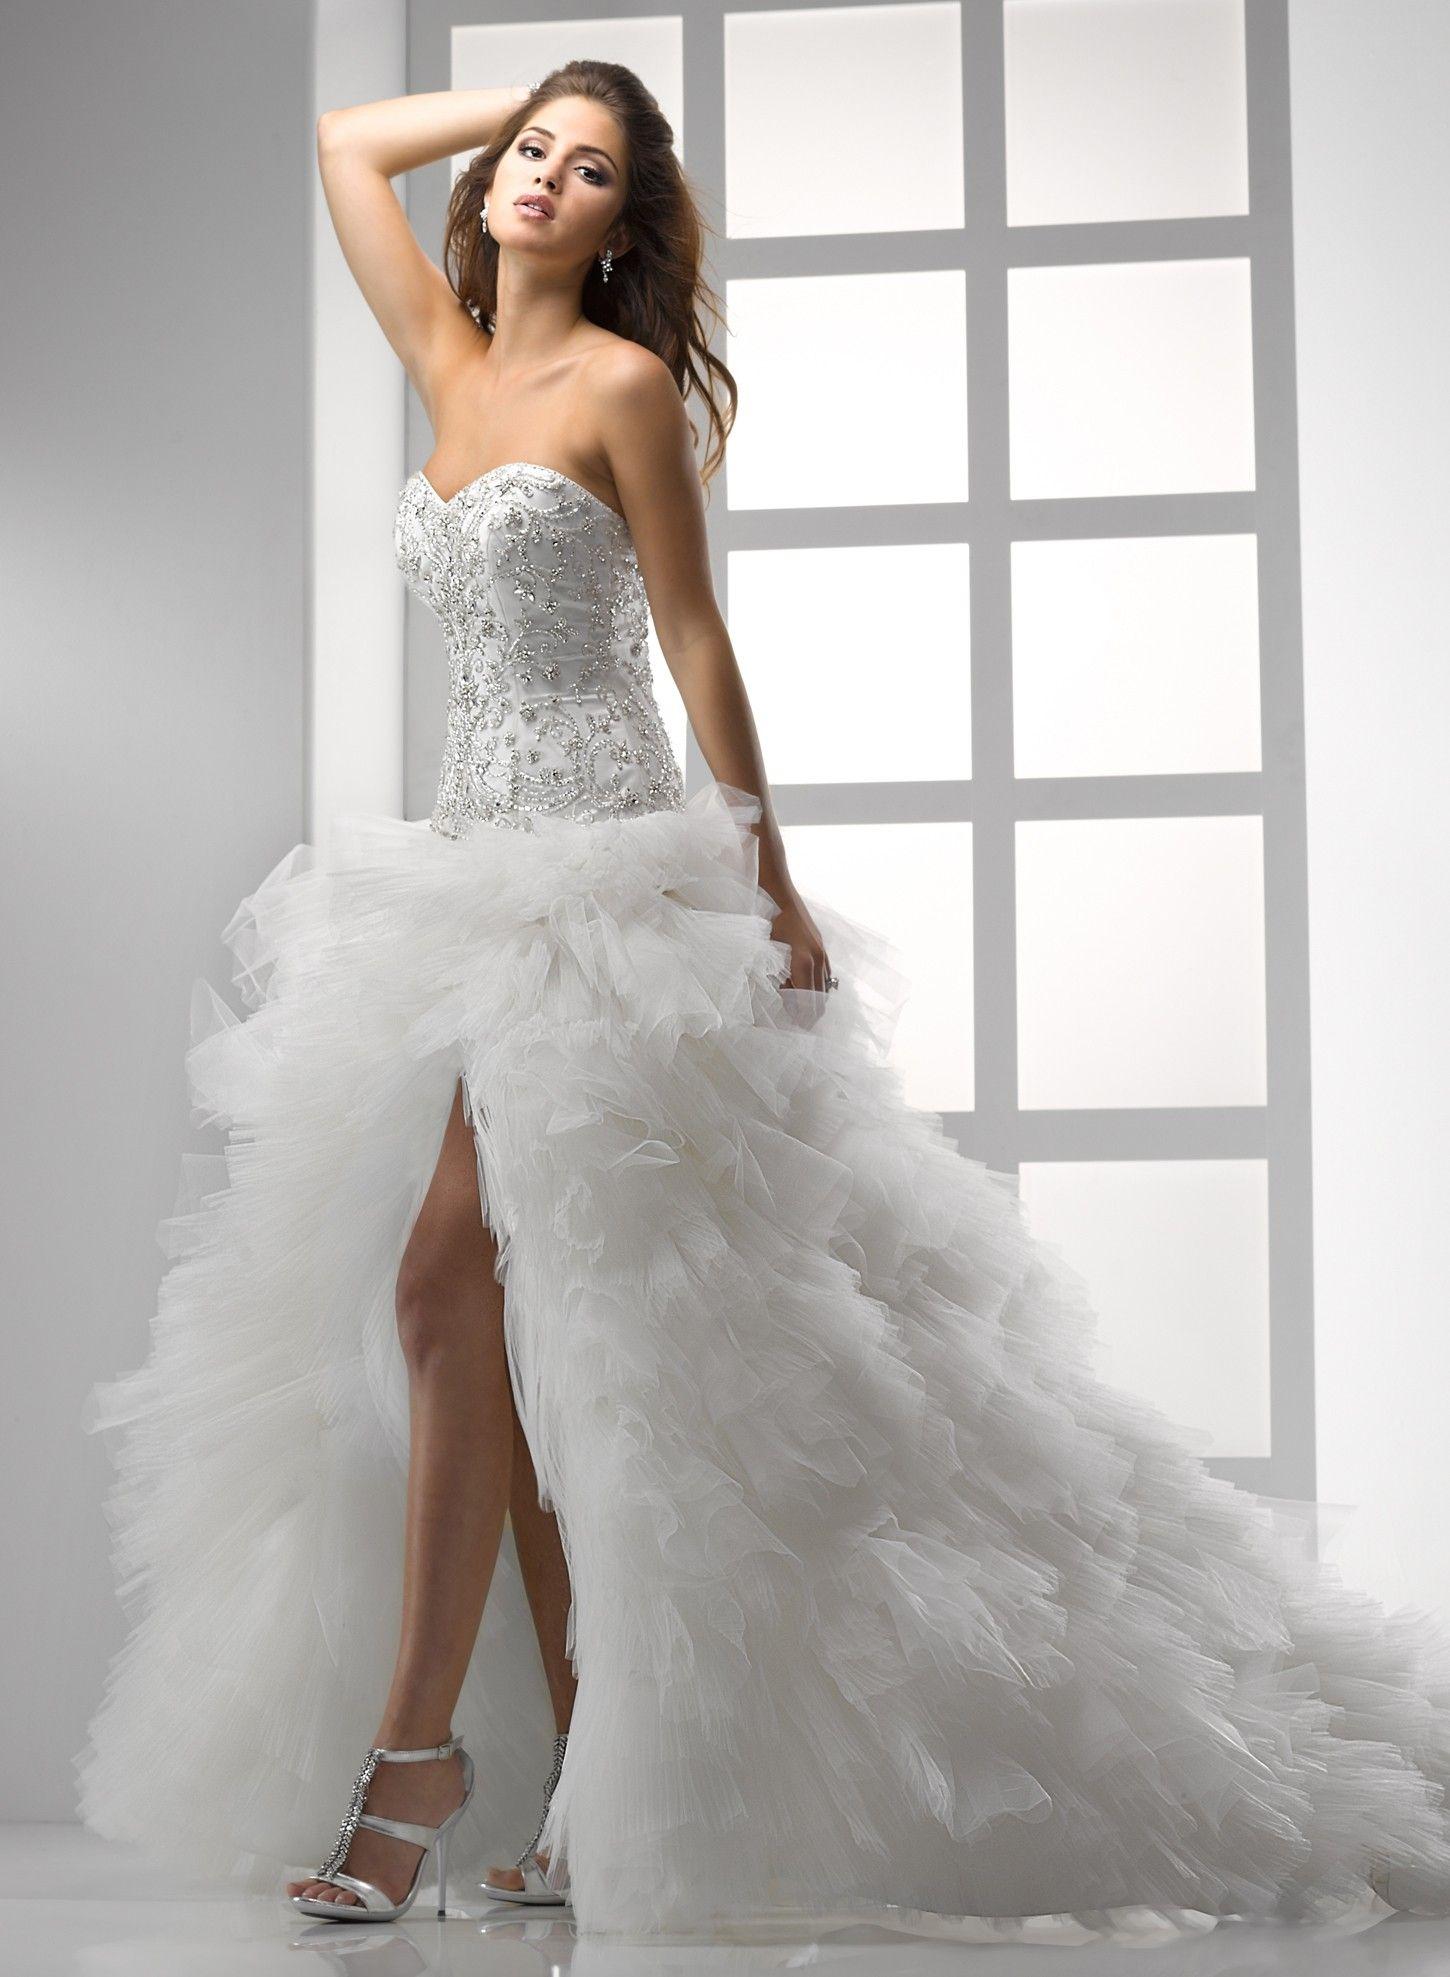 Cheap high low wedding dresses  TULLE HIGHSLIT BALL GOWN SWEETHEART NECKLINE WEDDING DRESS  Dream